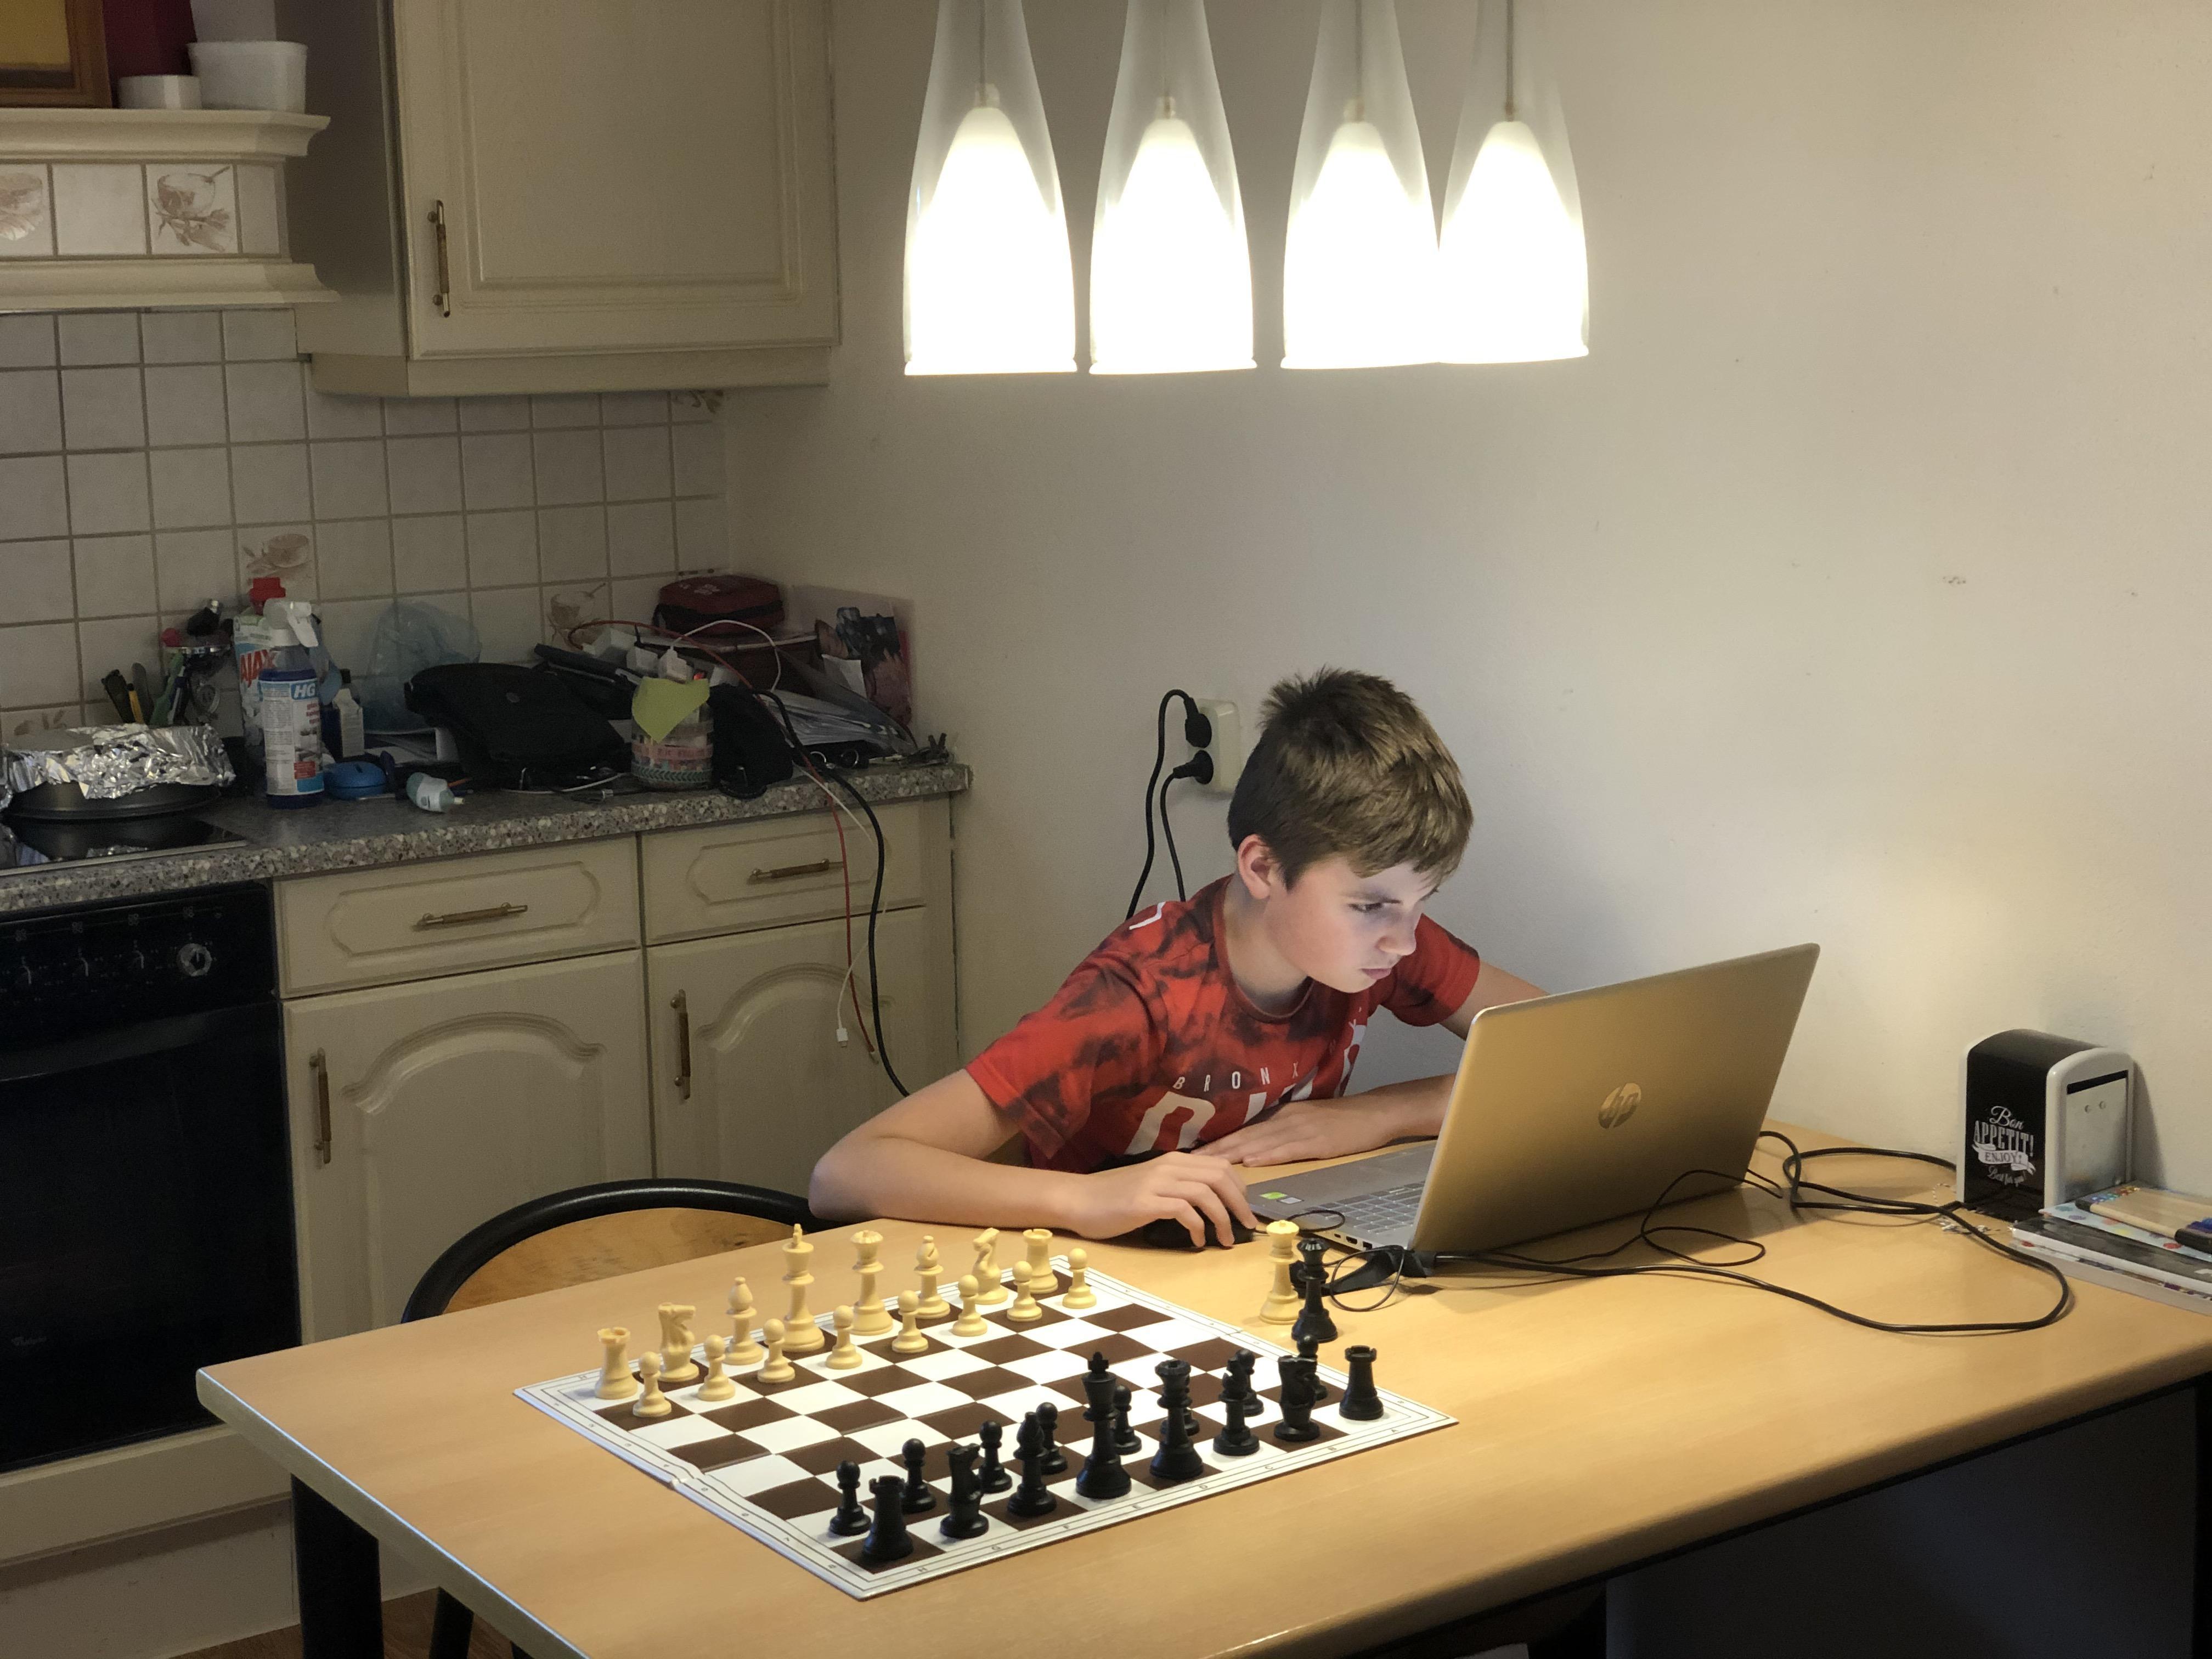 Ogen internationale schaakwereld op gericht op Robin Duson uit Hoorn en Romayn Brandsma uit Purmerend die online op goudjacht gaan